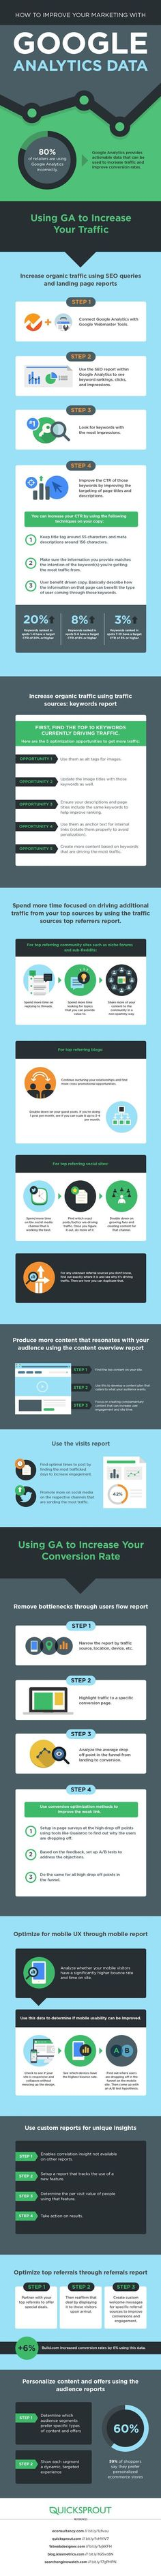 Google analytics can help improve your social media marketing.